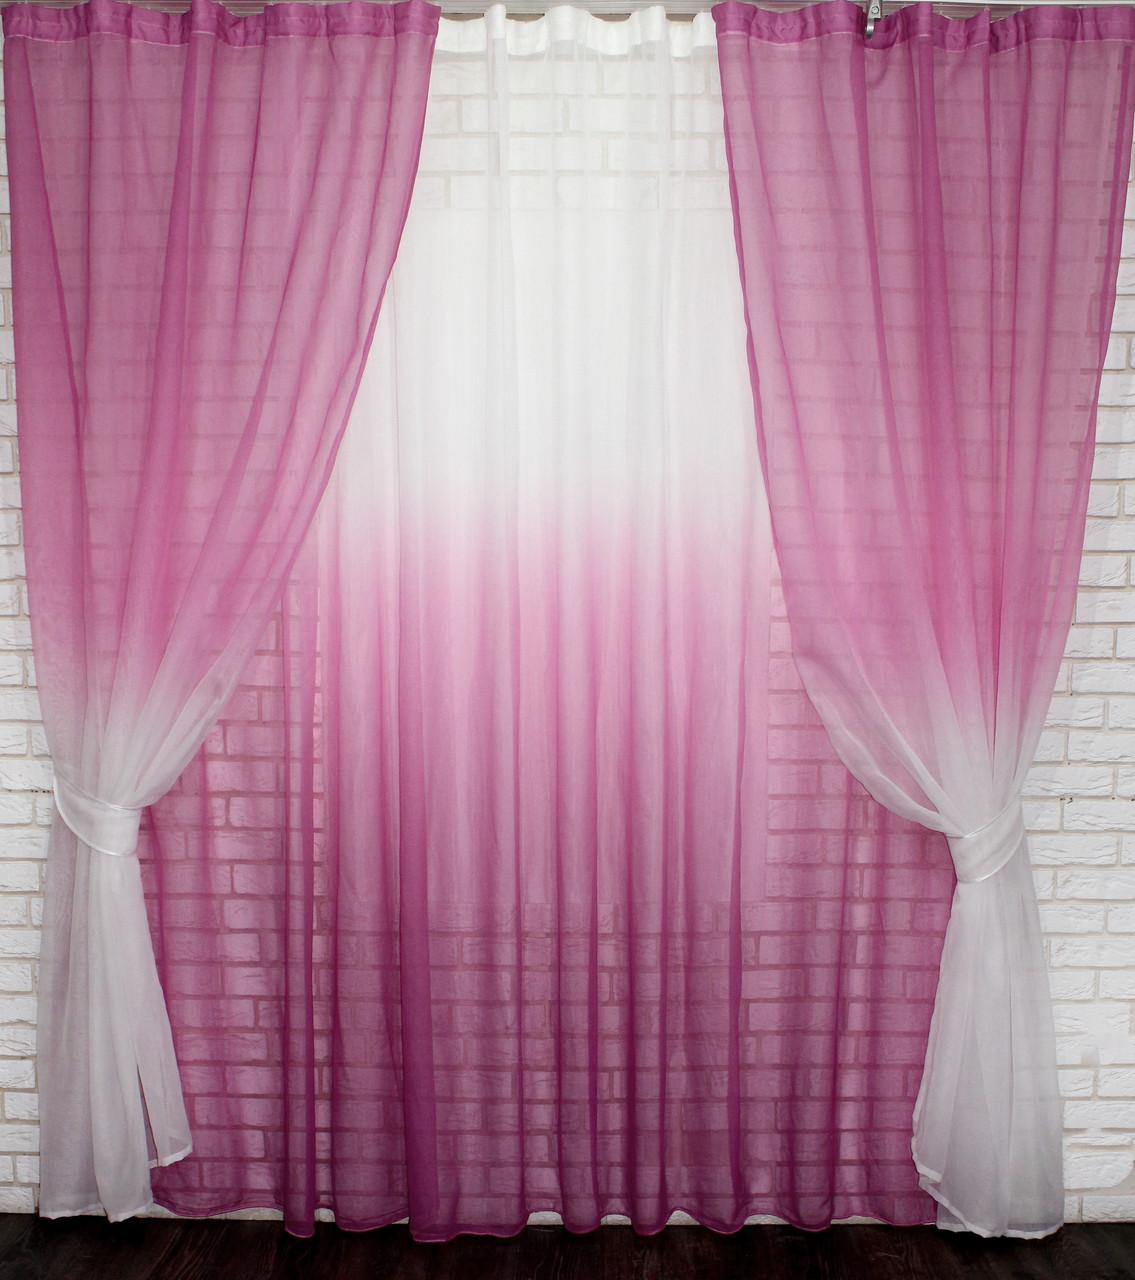 "Комплект растяжка ""Омбре"", ткань батист, под лён.  (2шт. 1,5х2,5м.+4х2,5м.)   Цвет розовый с белым 10-012"